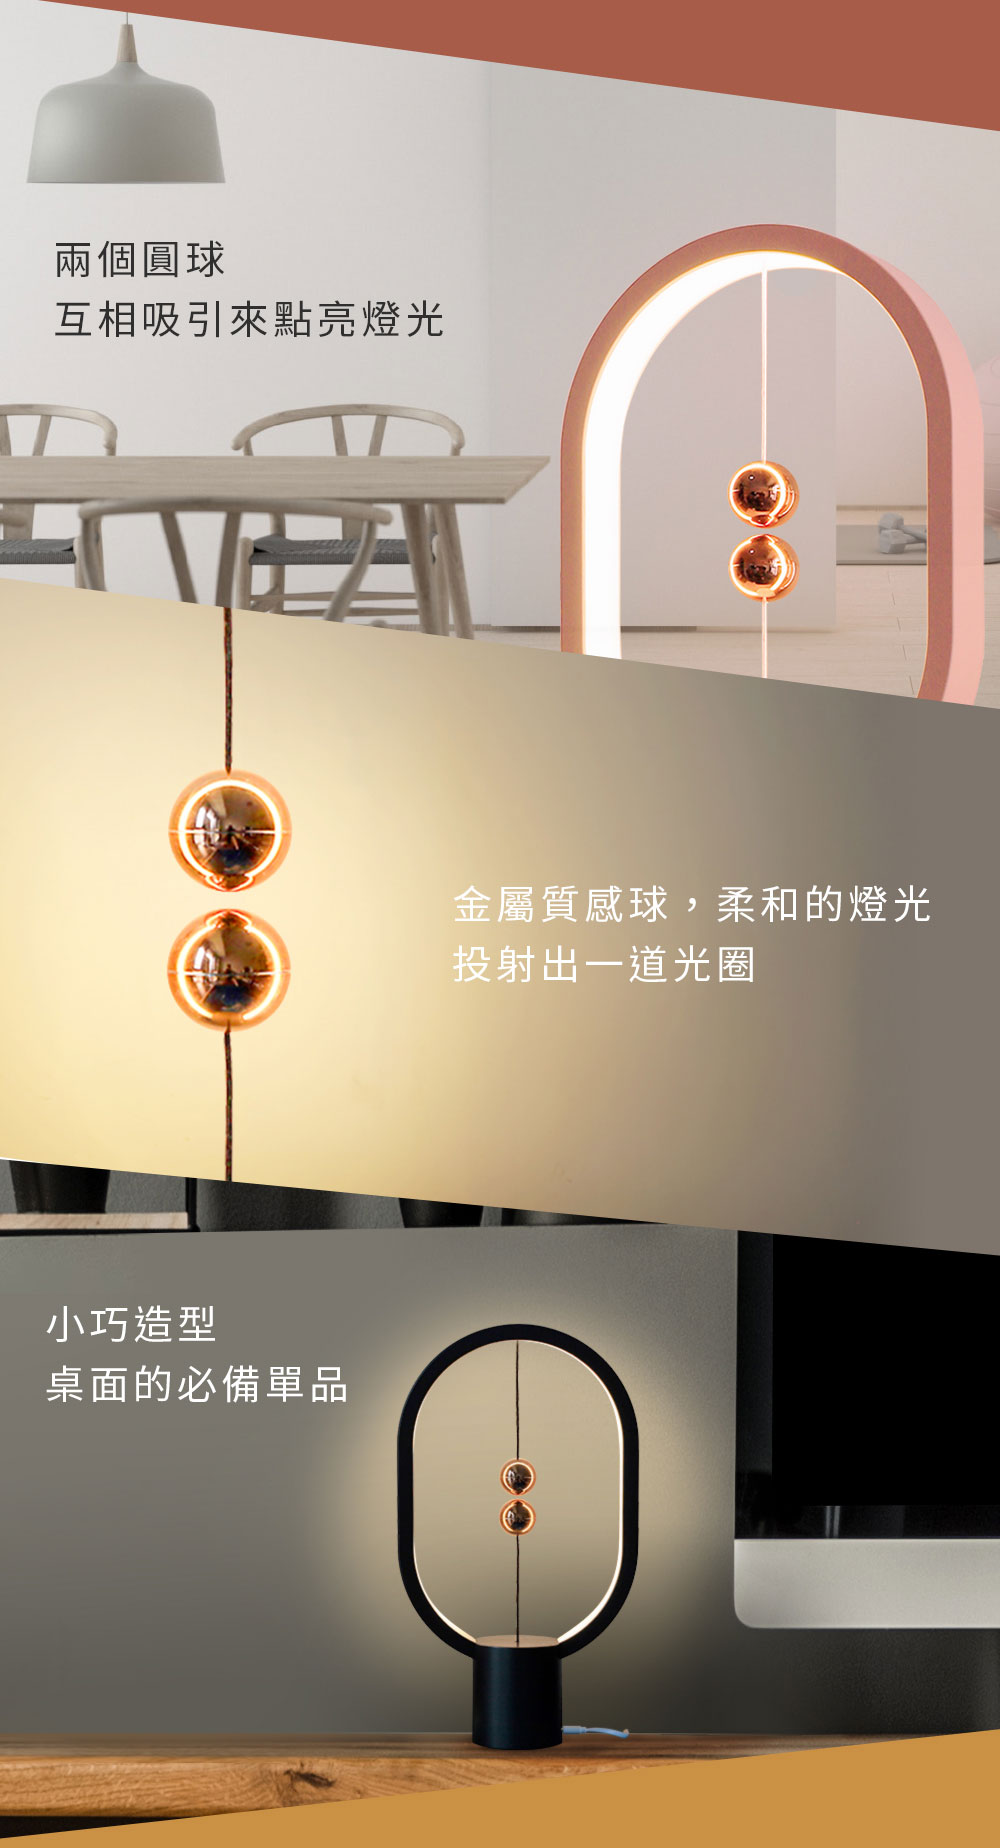 ZAN DESIGN - Heng PRO 衡燈mini 2.0 橢圓 (沉穩黑)